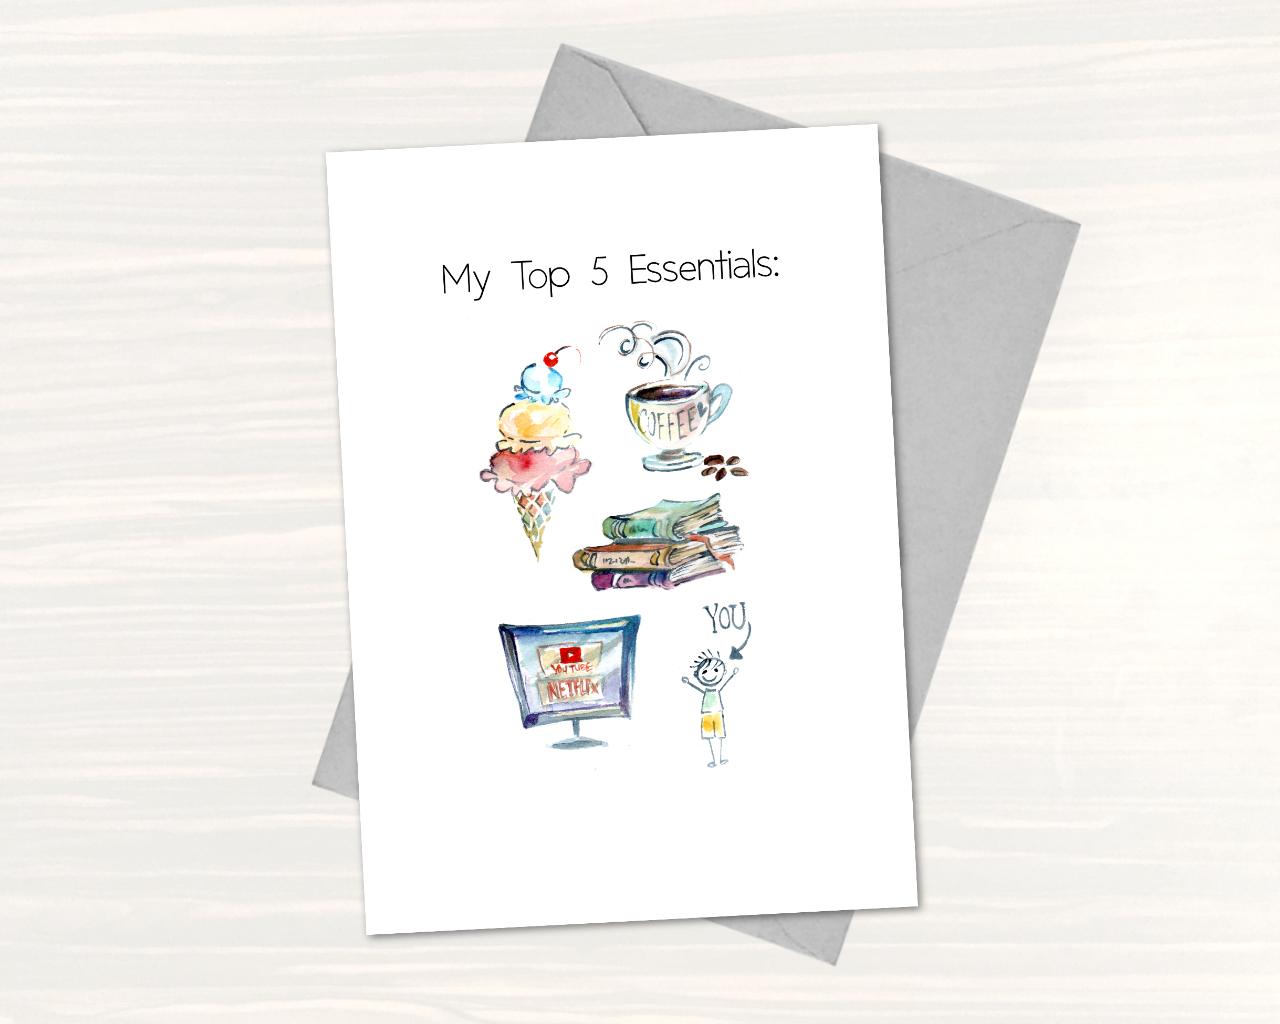 essentials-web-1